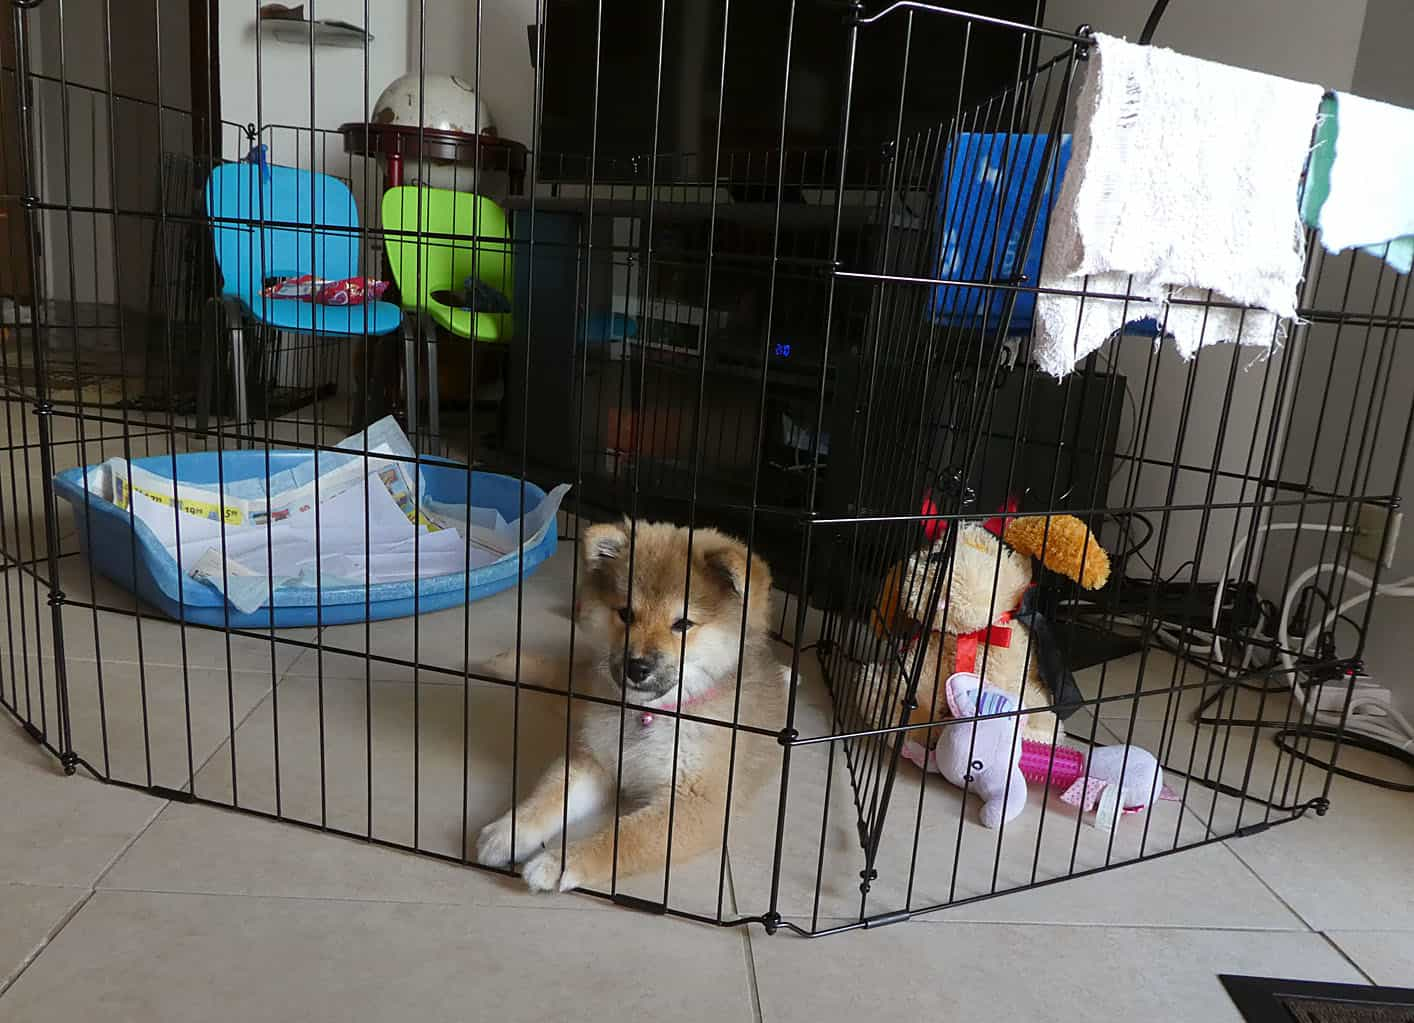 How To Potty Train Your Shiba Inu Puppy